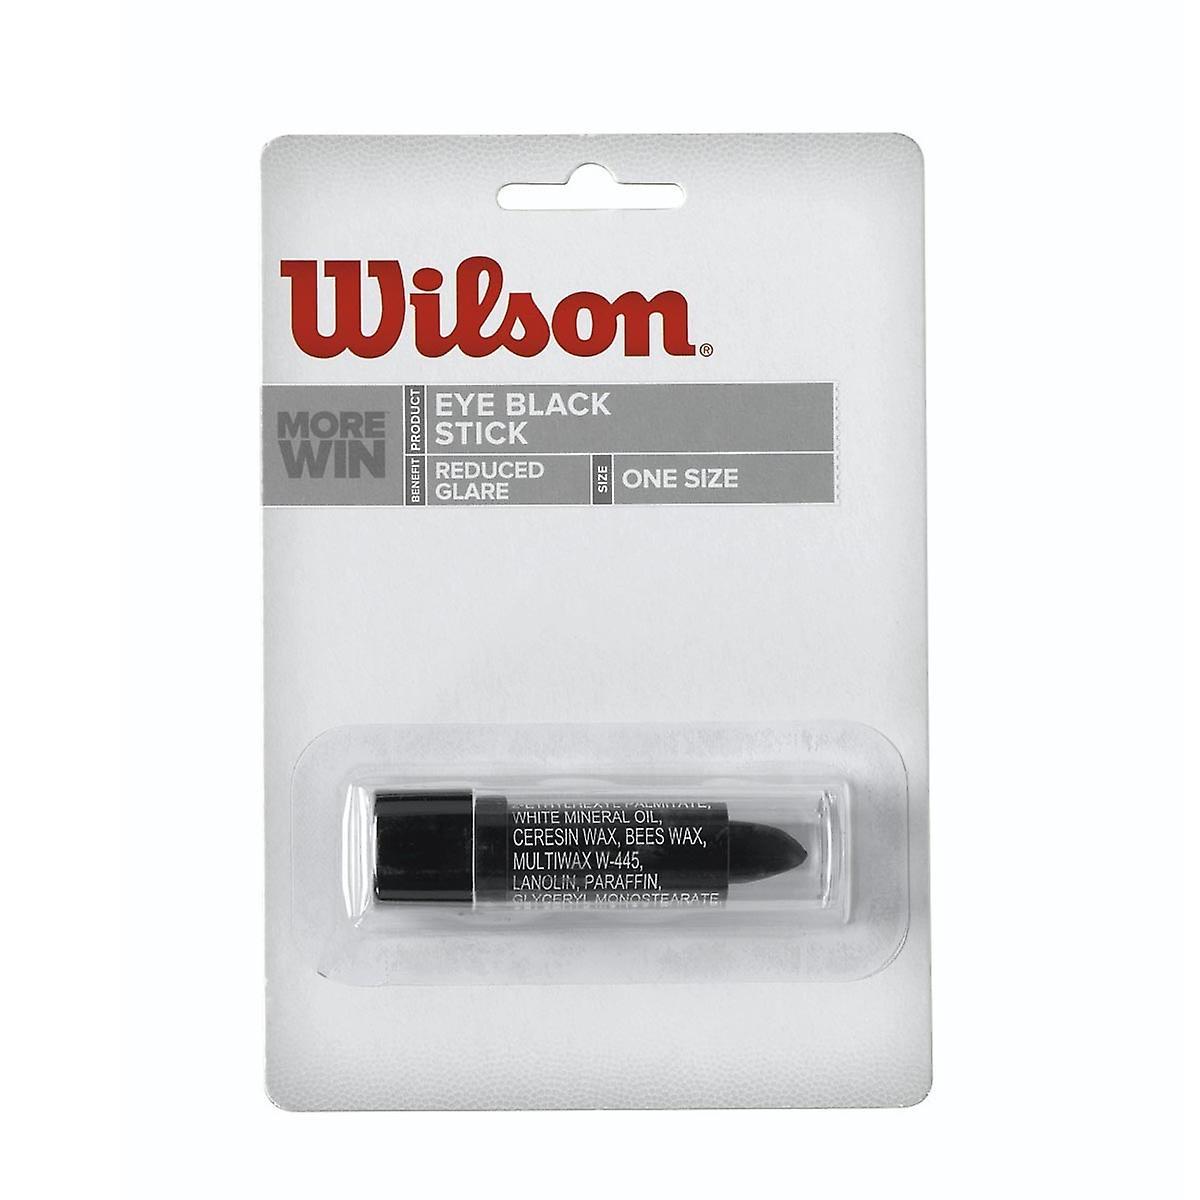 Wilson NFL Eye Black Stick Match Day Anti Glare American Football Face Paint